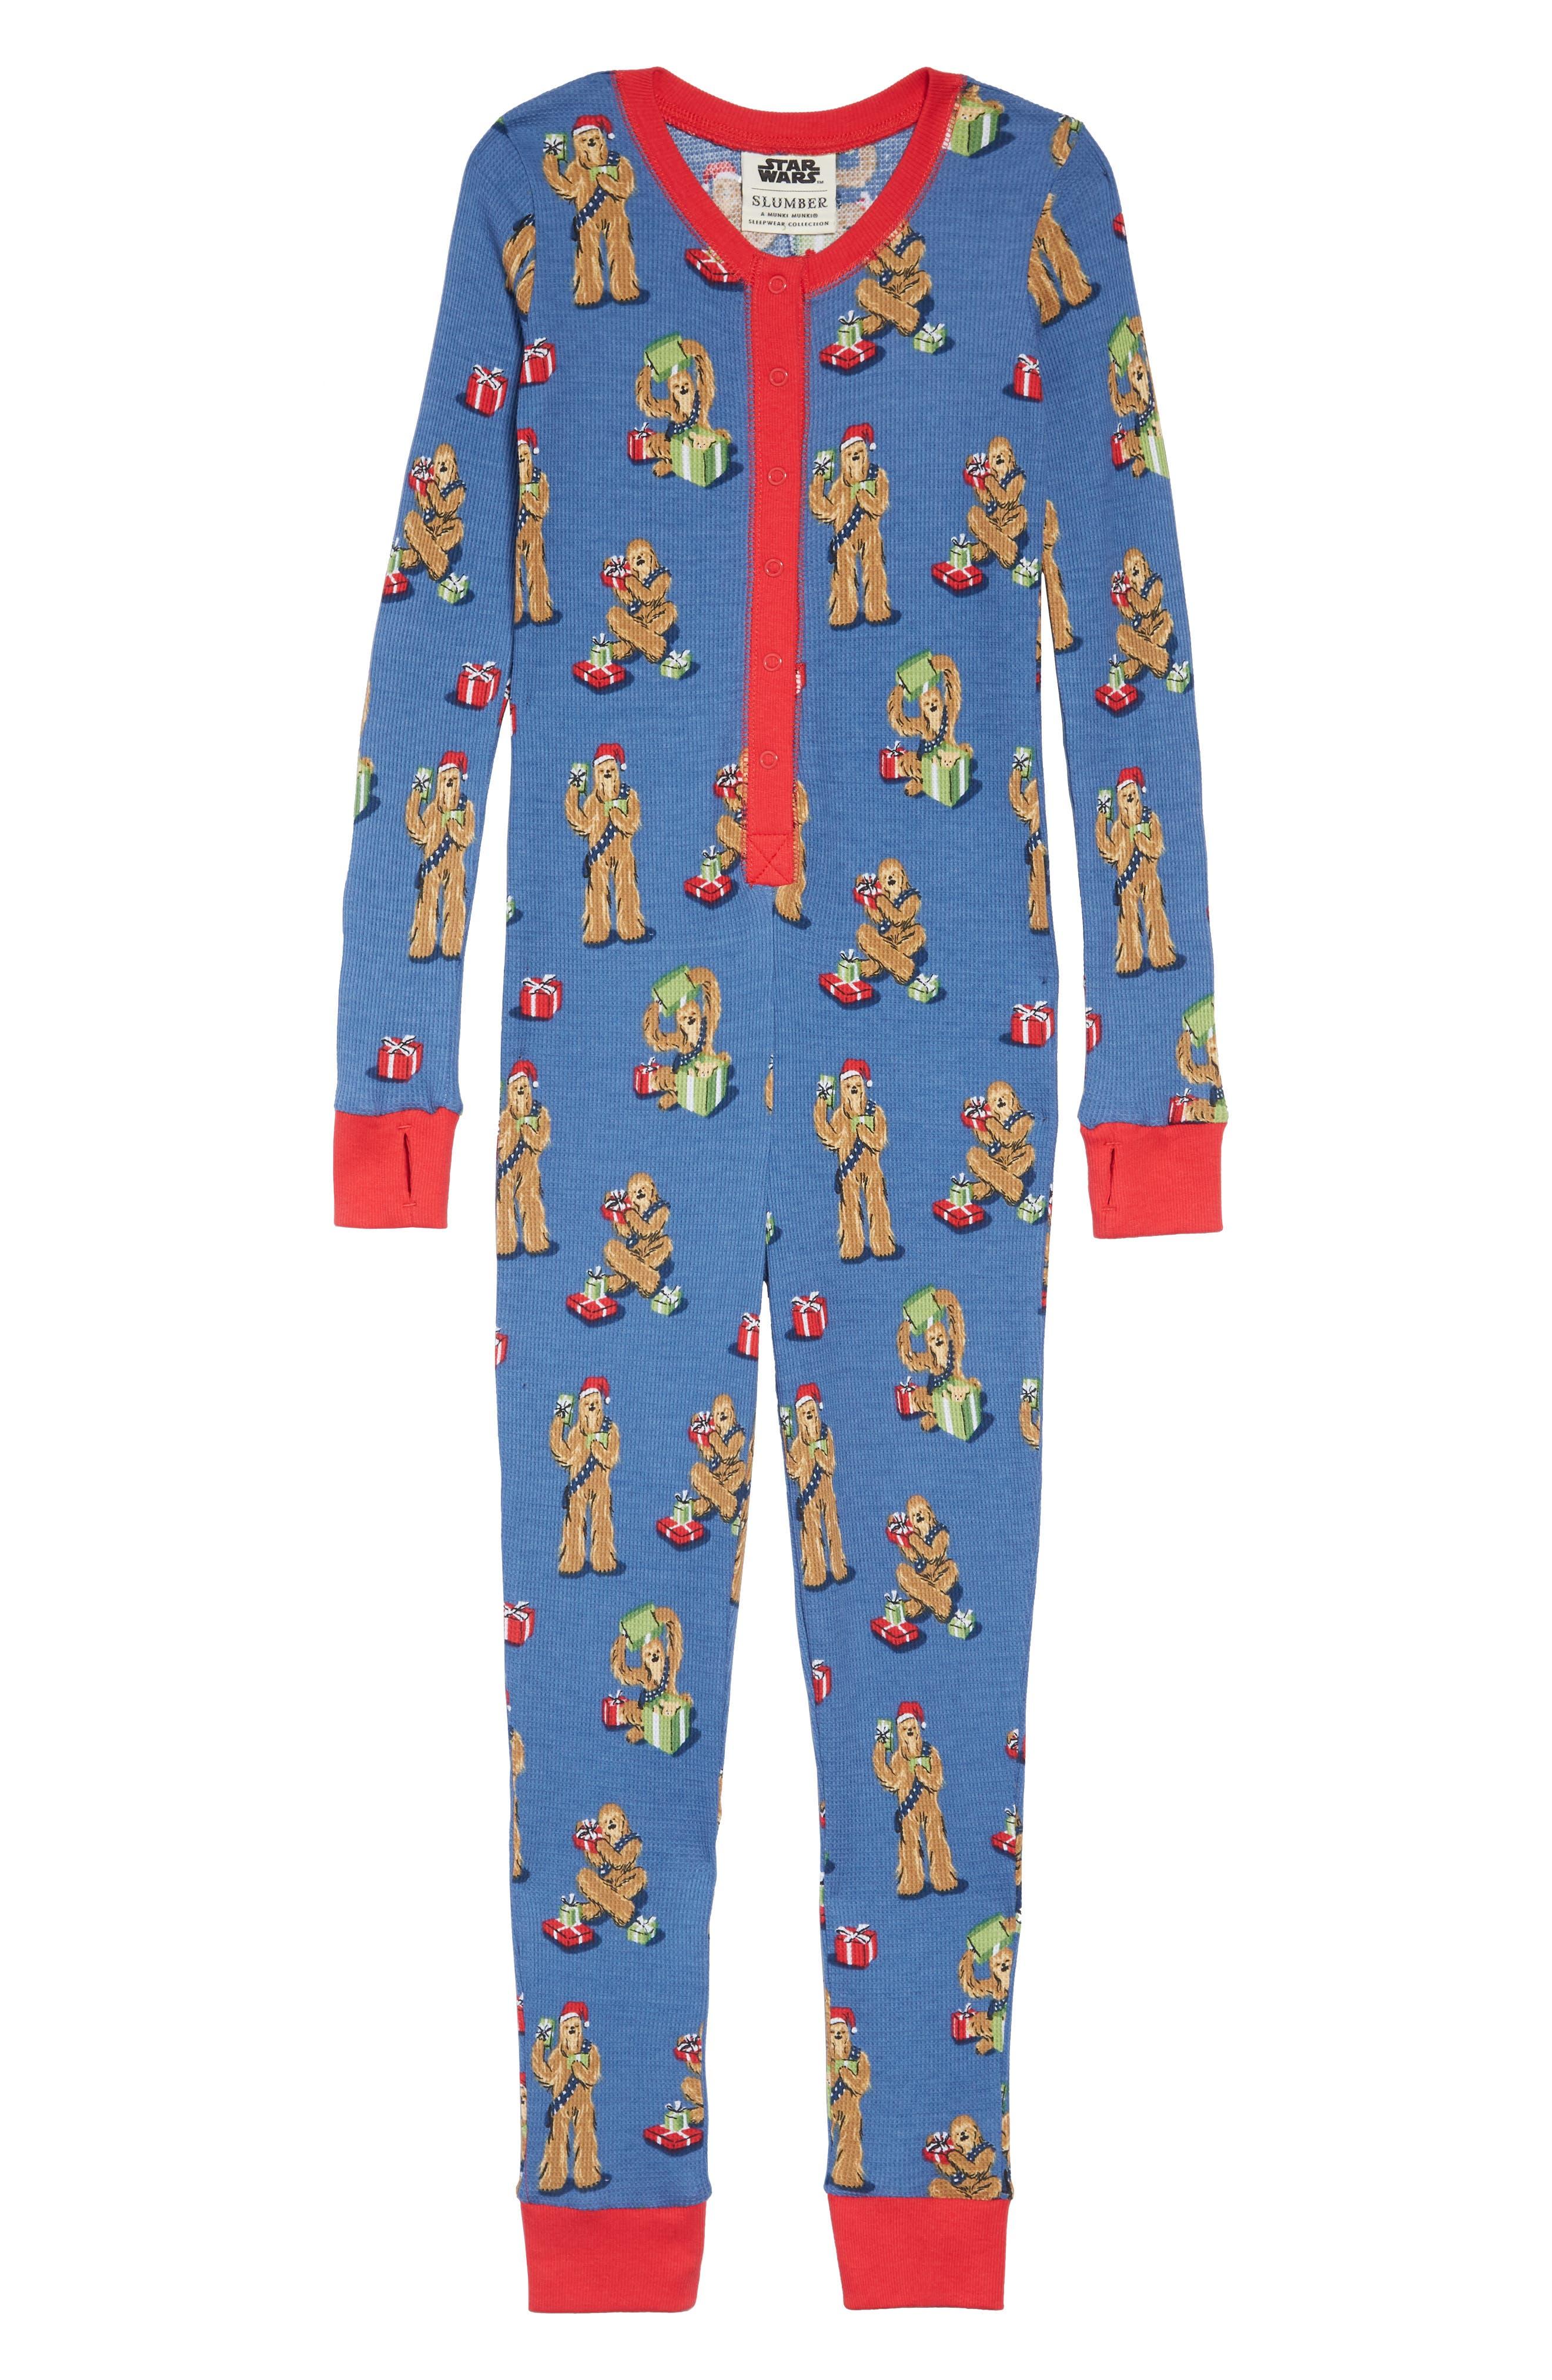 Toddler Munki Munki X Star Wars(TM) Christmas Chewbacca Fitted OnePiece Pajamas Size 4T  Blue